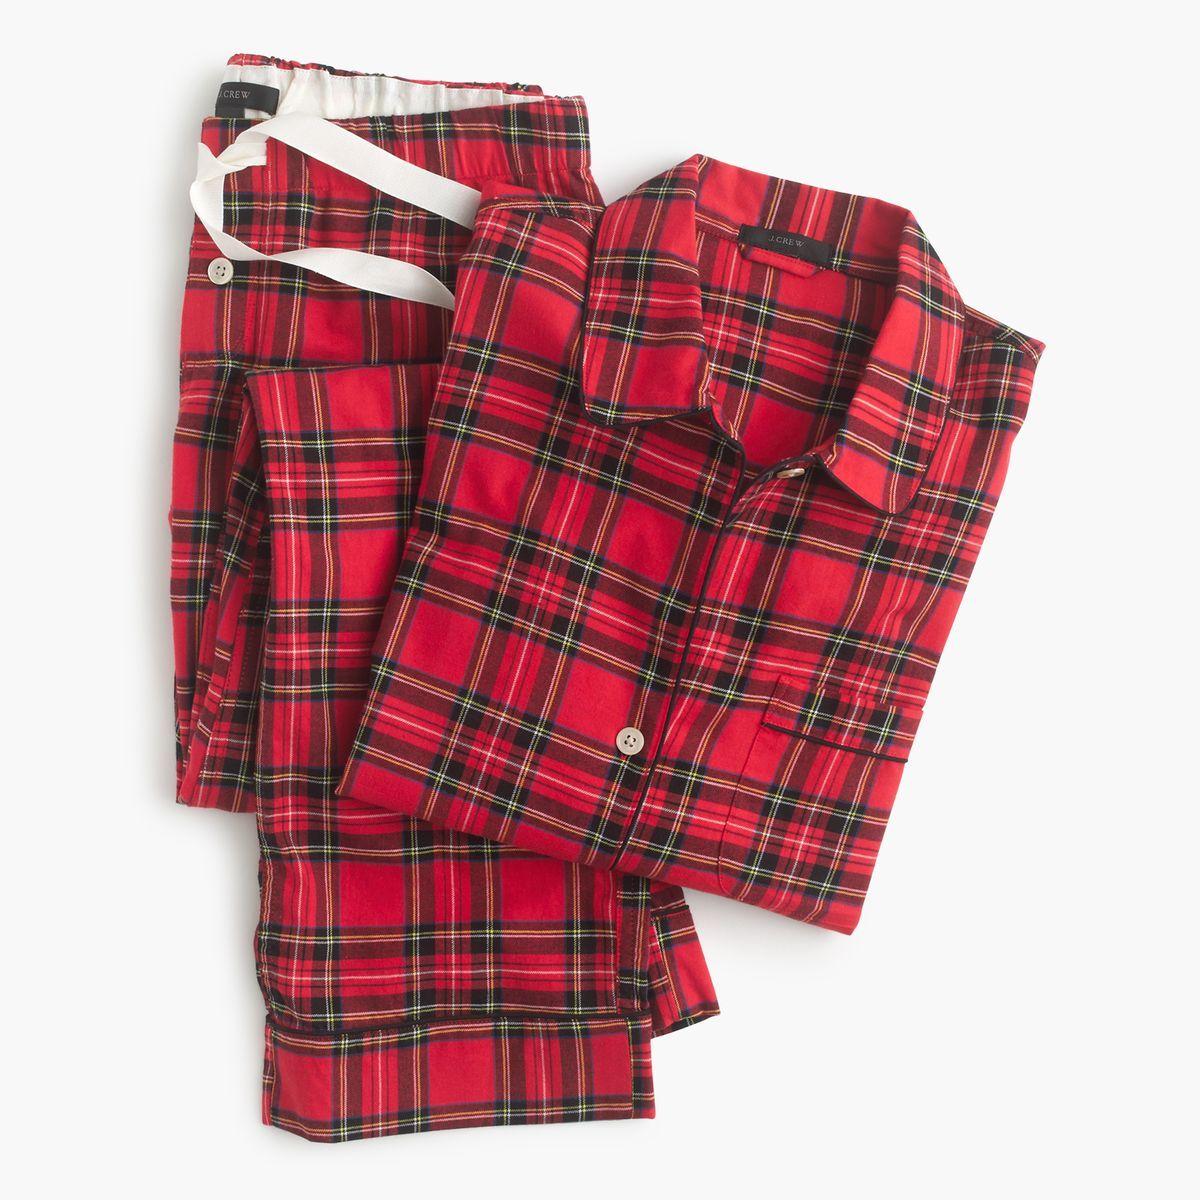 J.Crew Gift Guide women's classic tartan flannel pajama